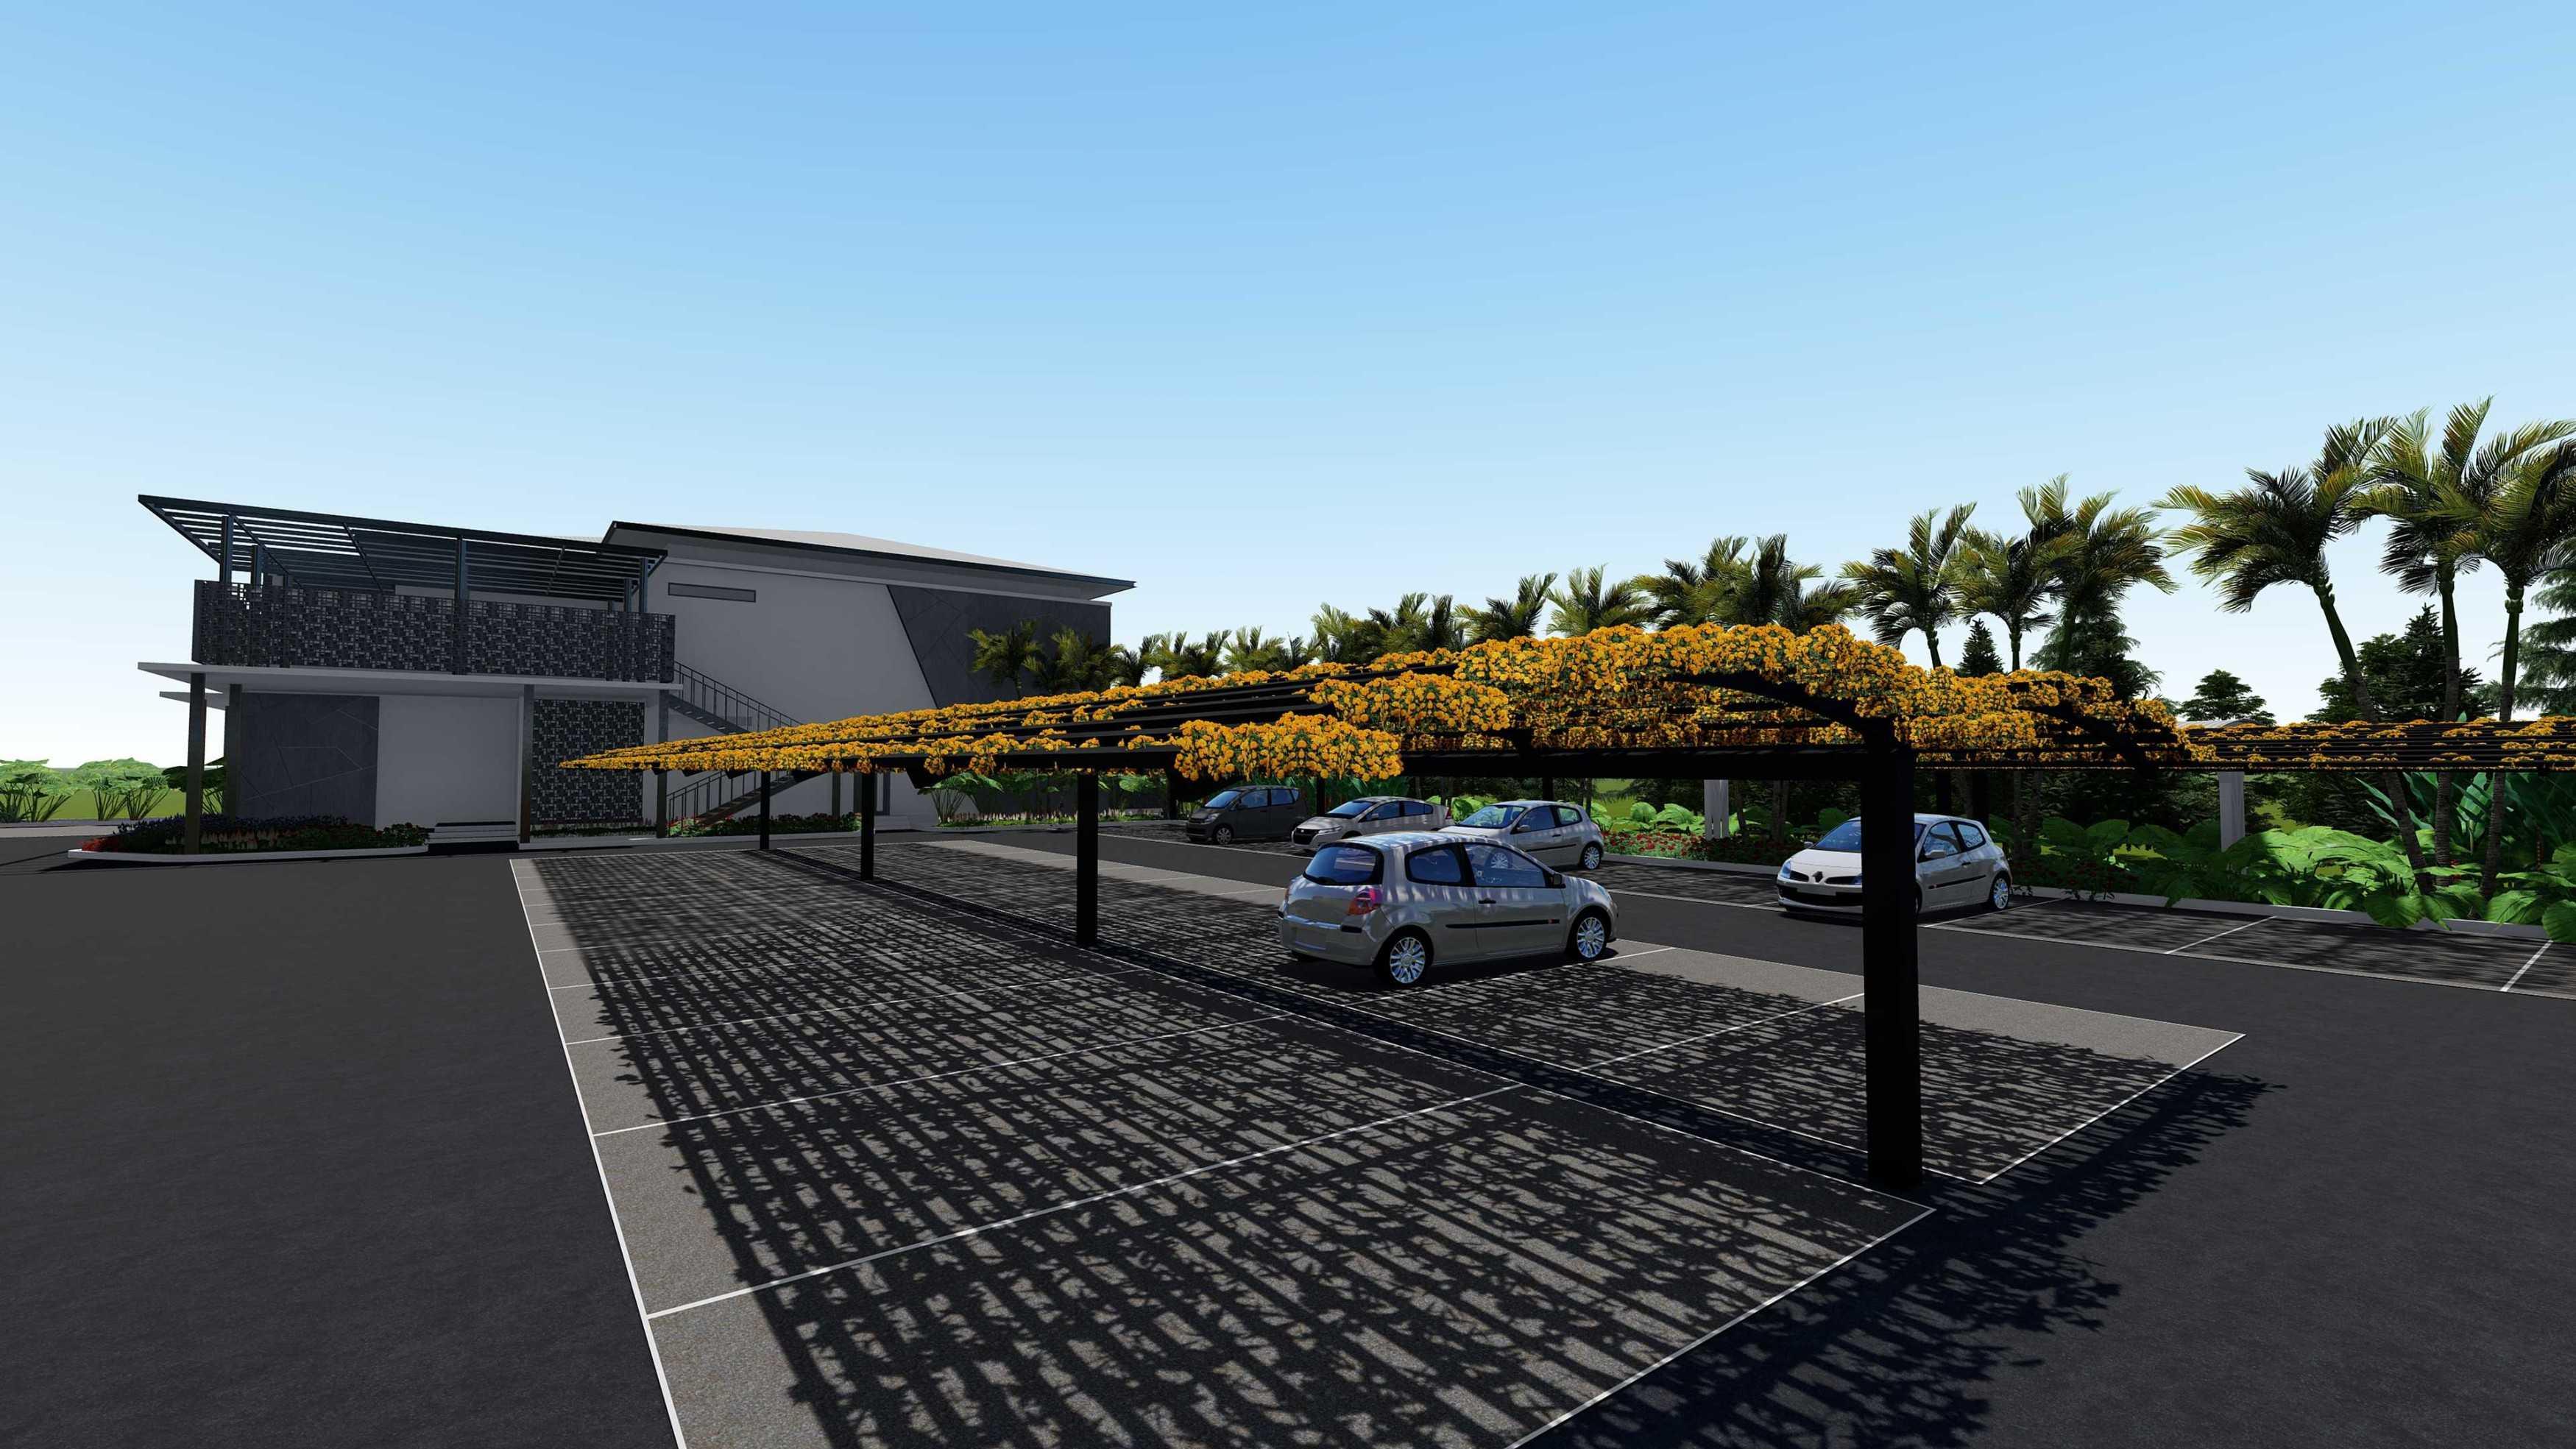 Raaj Gill Arsitek Aari Office Building & Laboratory Pekanbaru, Kota Pekanbaru, Riau, Indonesia Pekanbaru, Kota Pekanbaru, Riau, Indonesia Raaj-Gill-Arsitek-Aari-Office-Building-Laboratory   74677